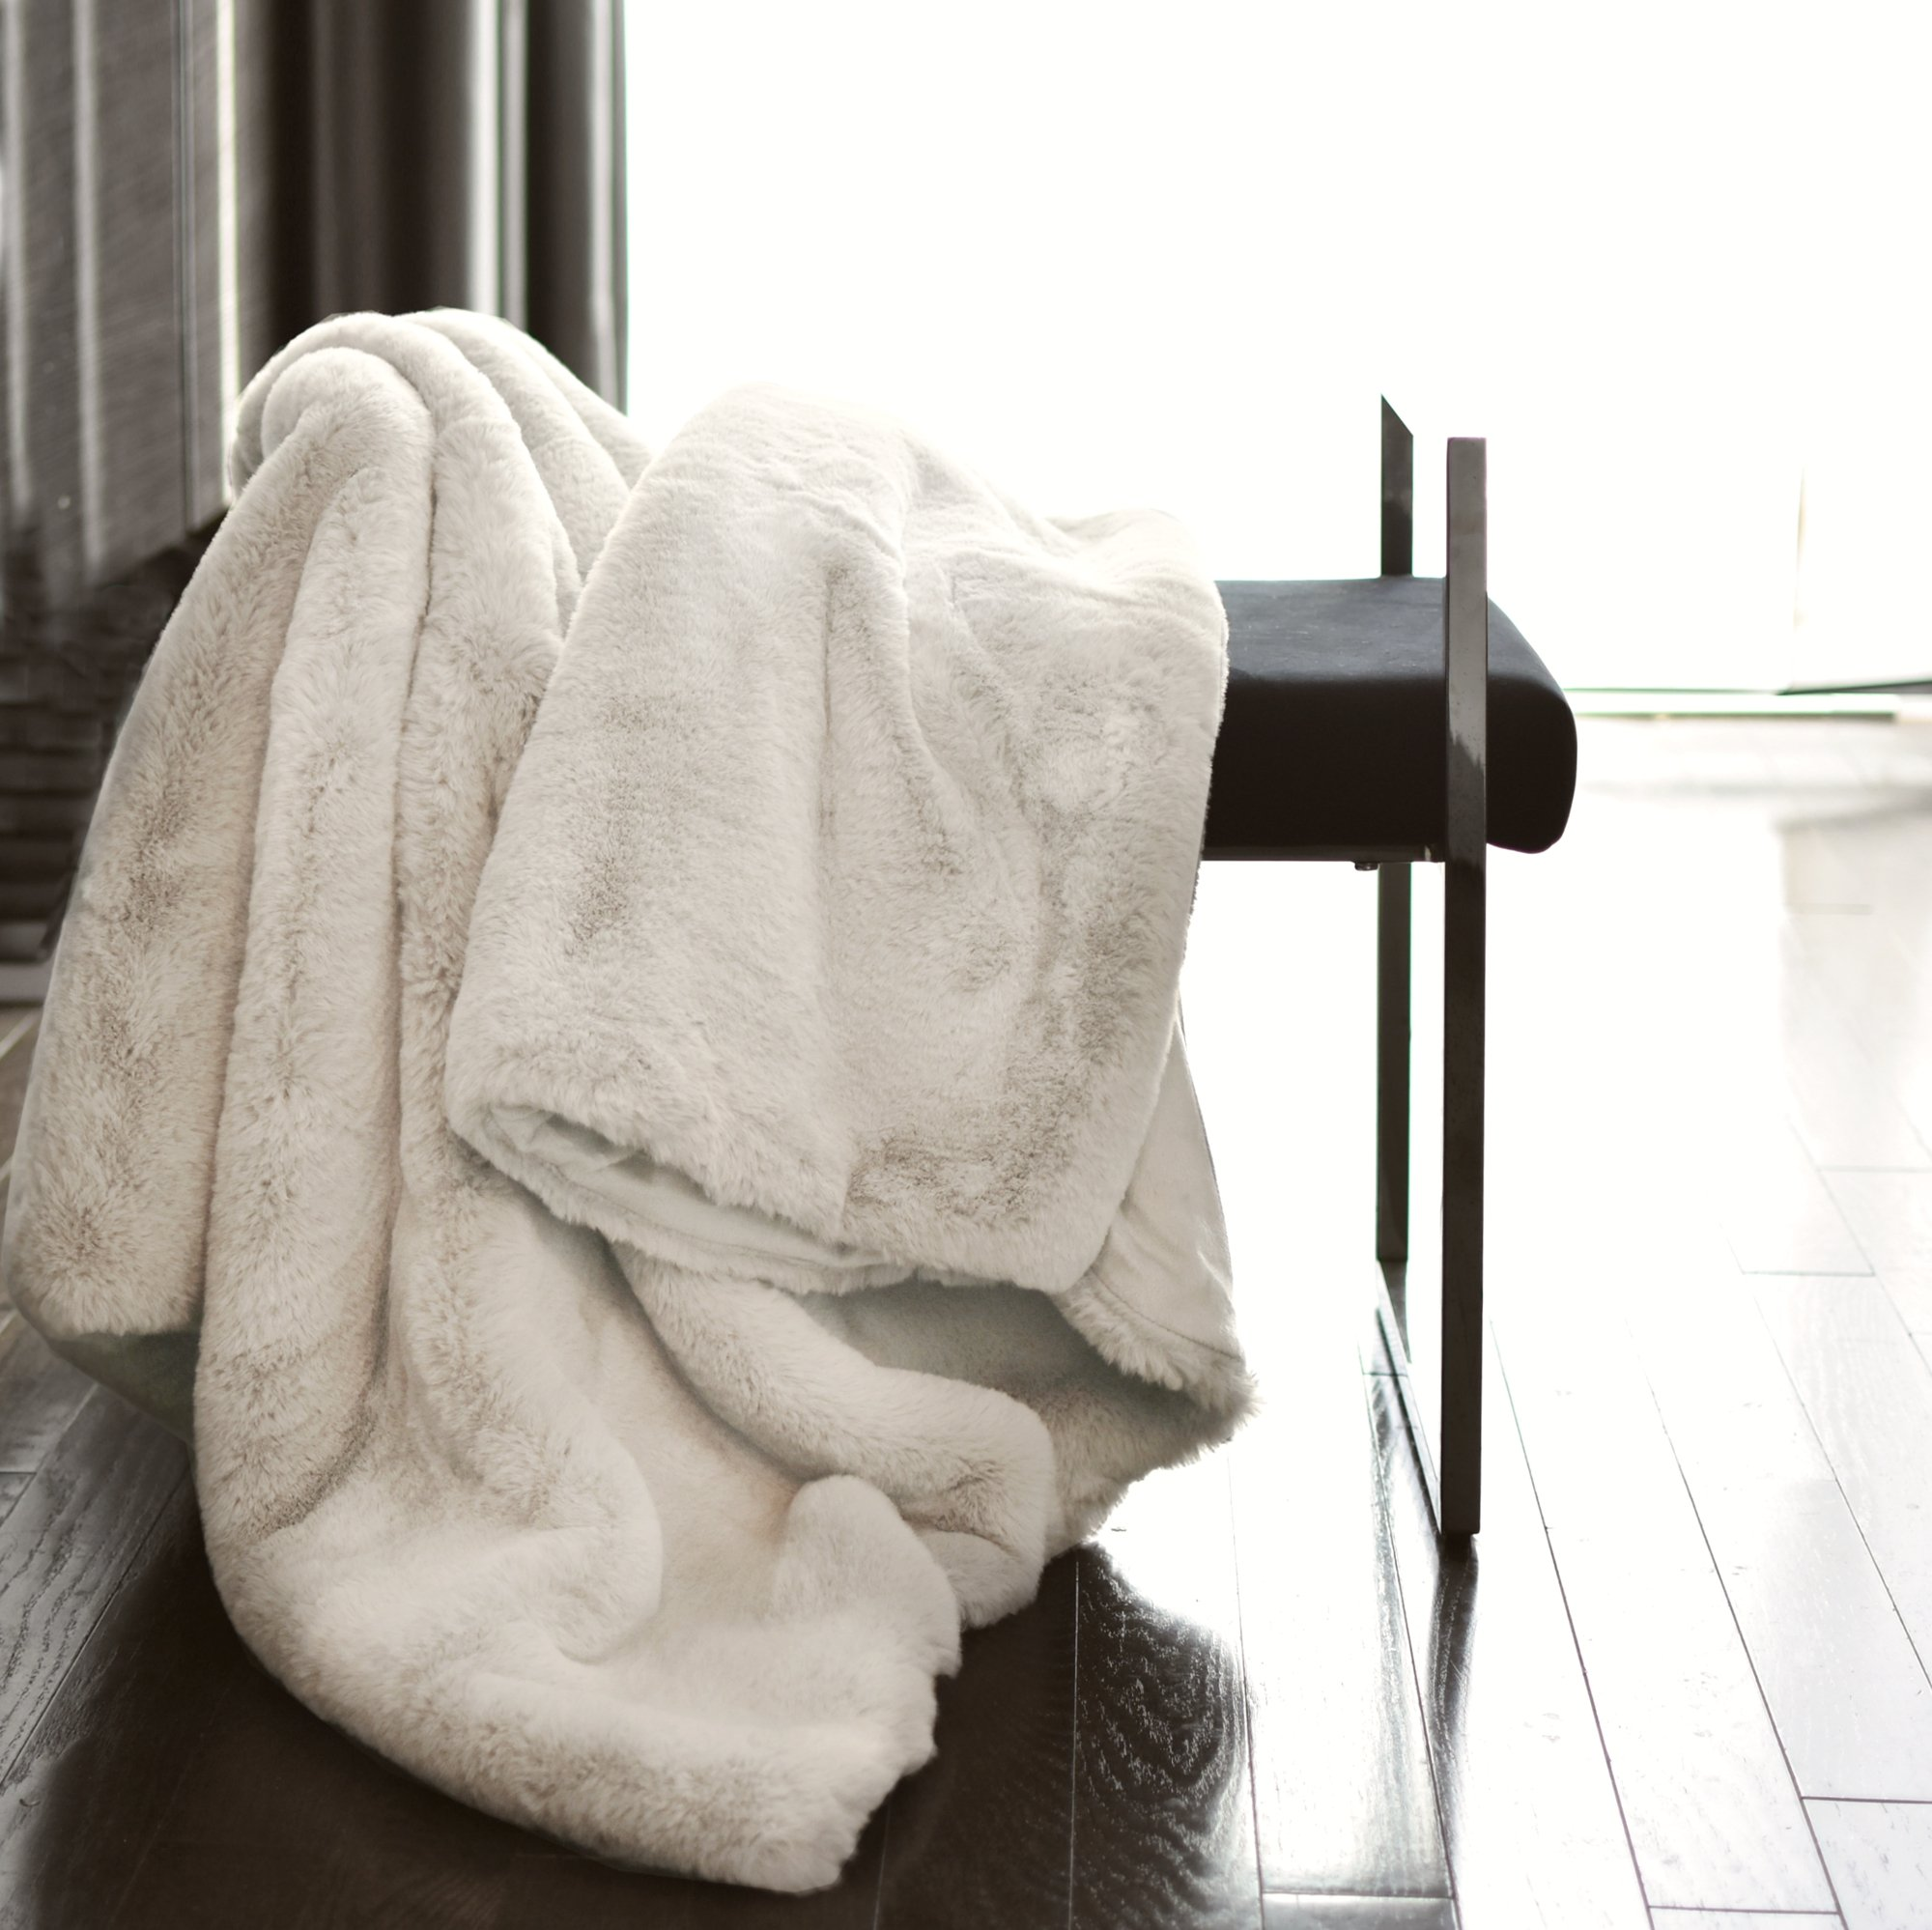 Tahari Mink Faux Fur Throw Luxury Silky Soft Blanket in Cream White (Ivory)